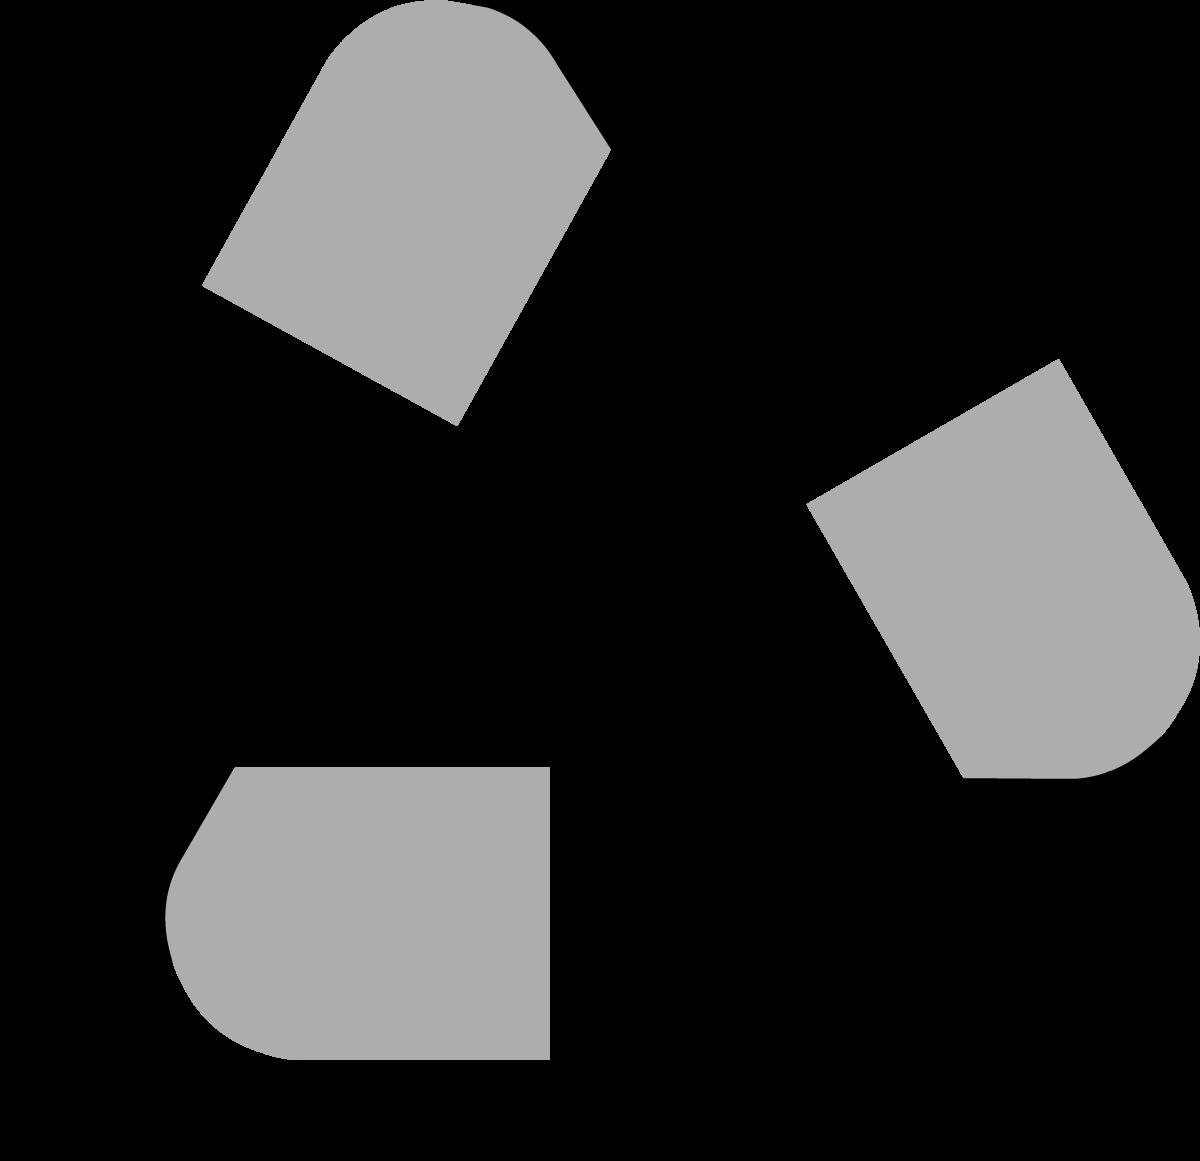 1200x1161 Black Universal Recycling Symbol Logo Sign